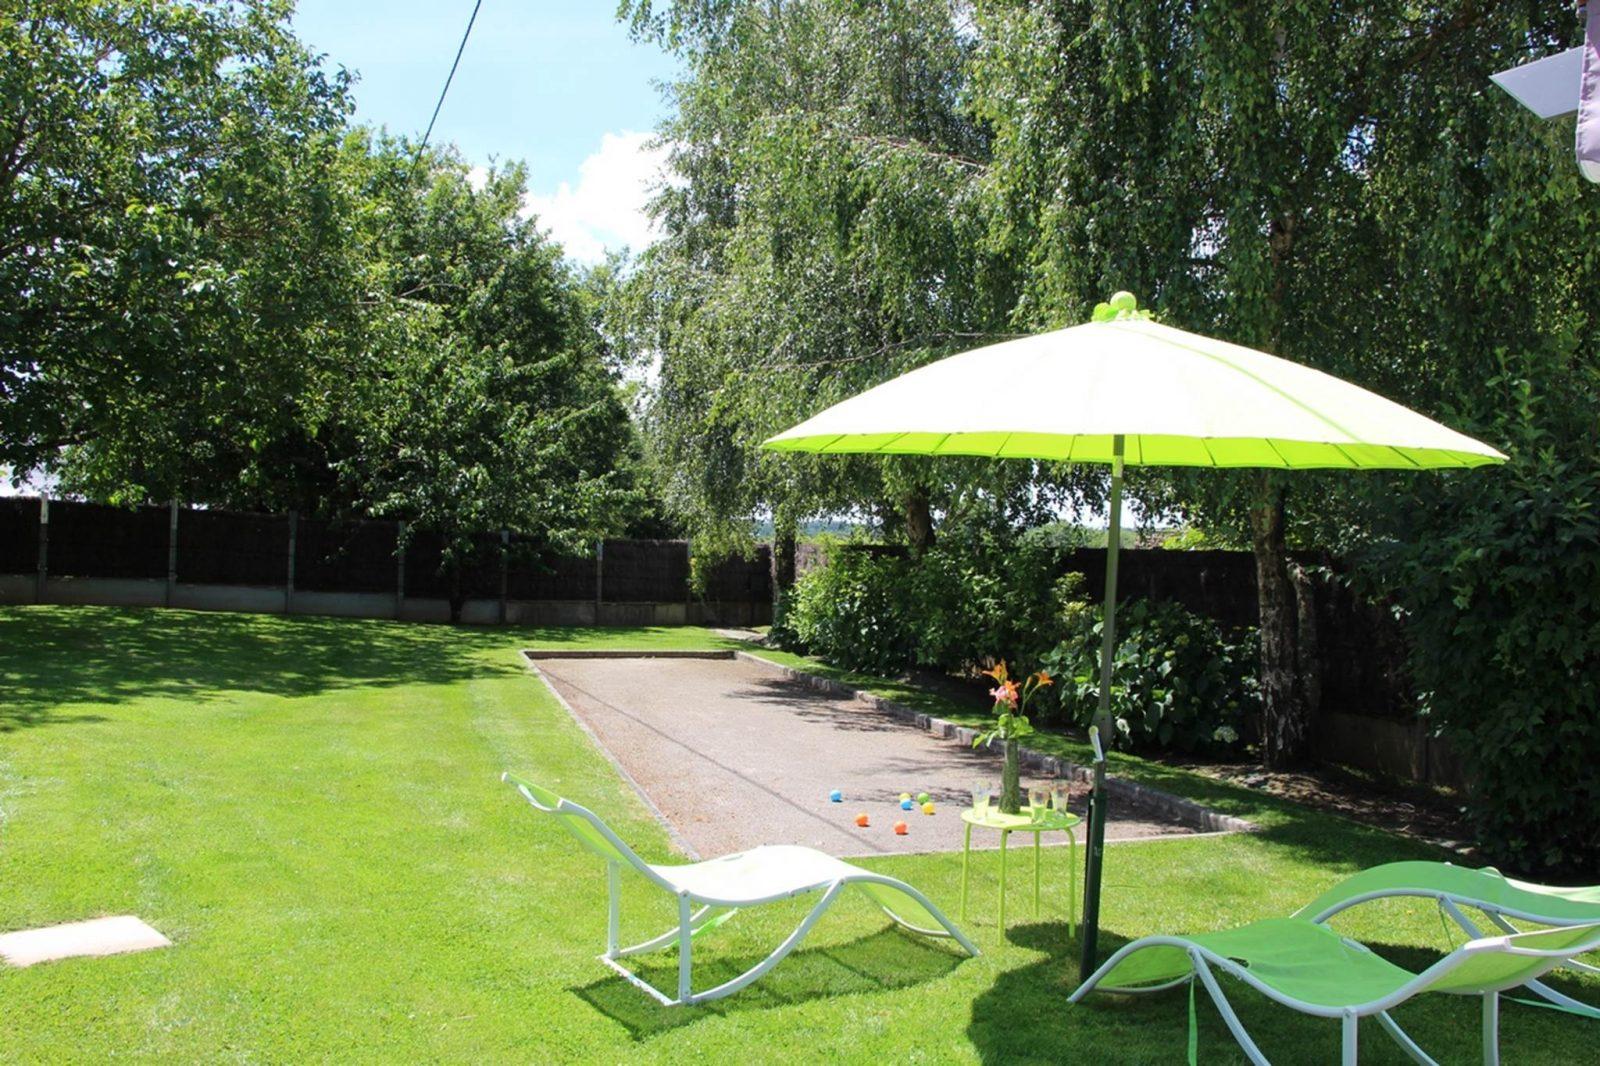 jardin – Robert- Nivillac – Damgan La Roche Bernard Tourisme